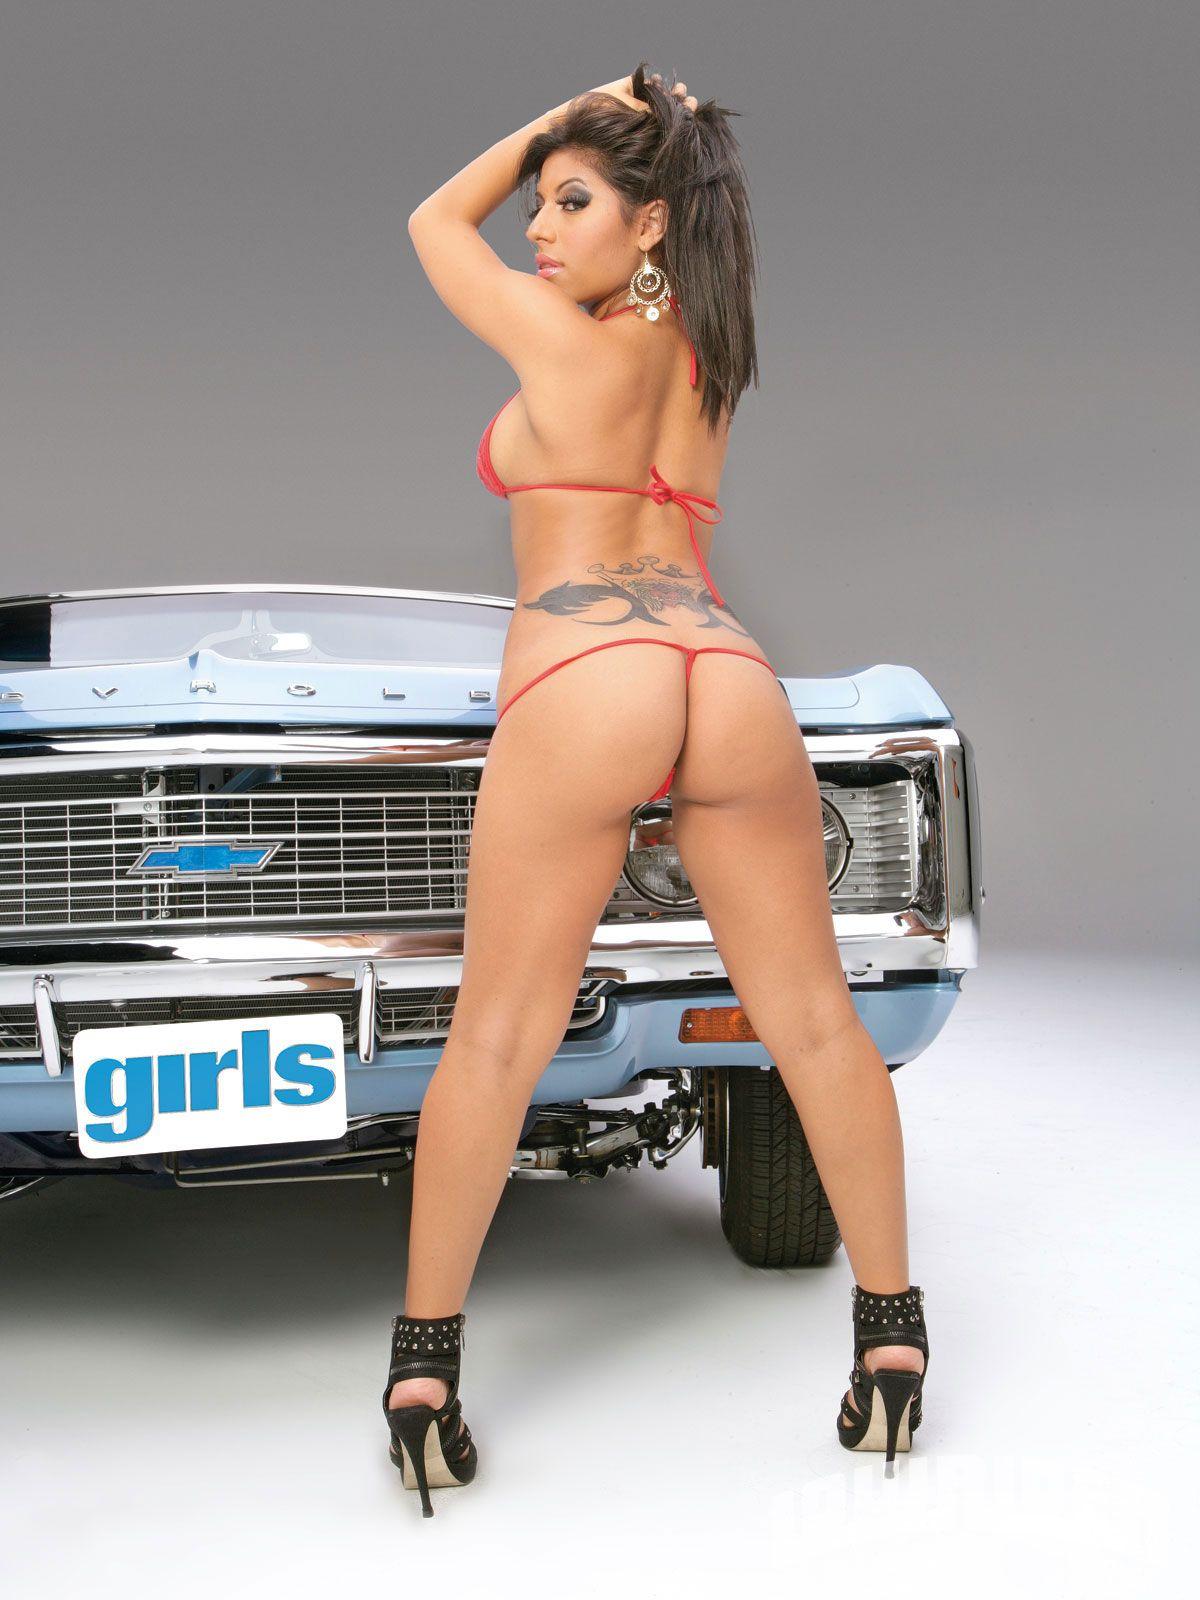 Think, Hot lowrider girls on bikes